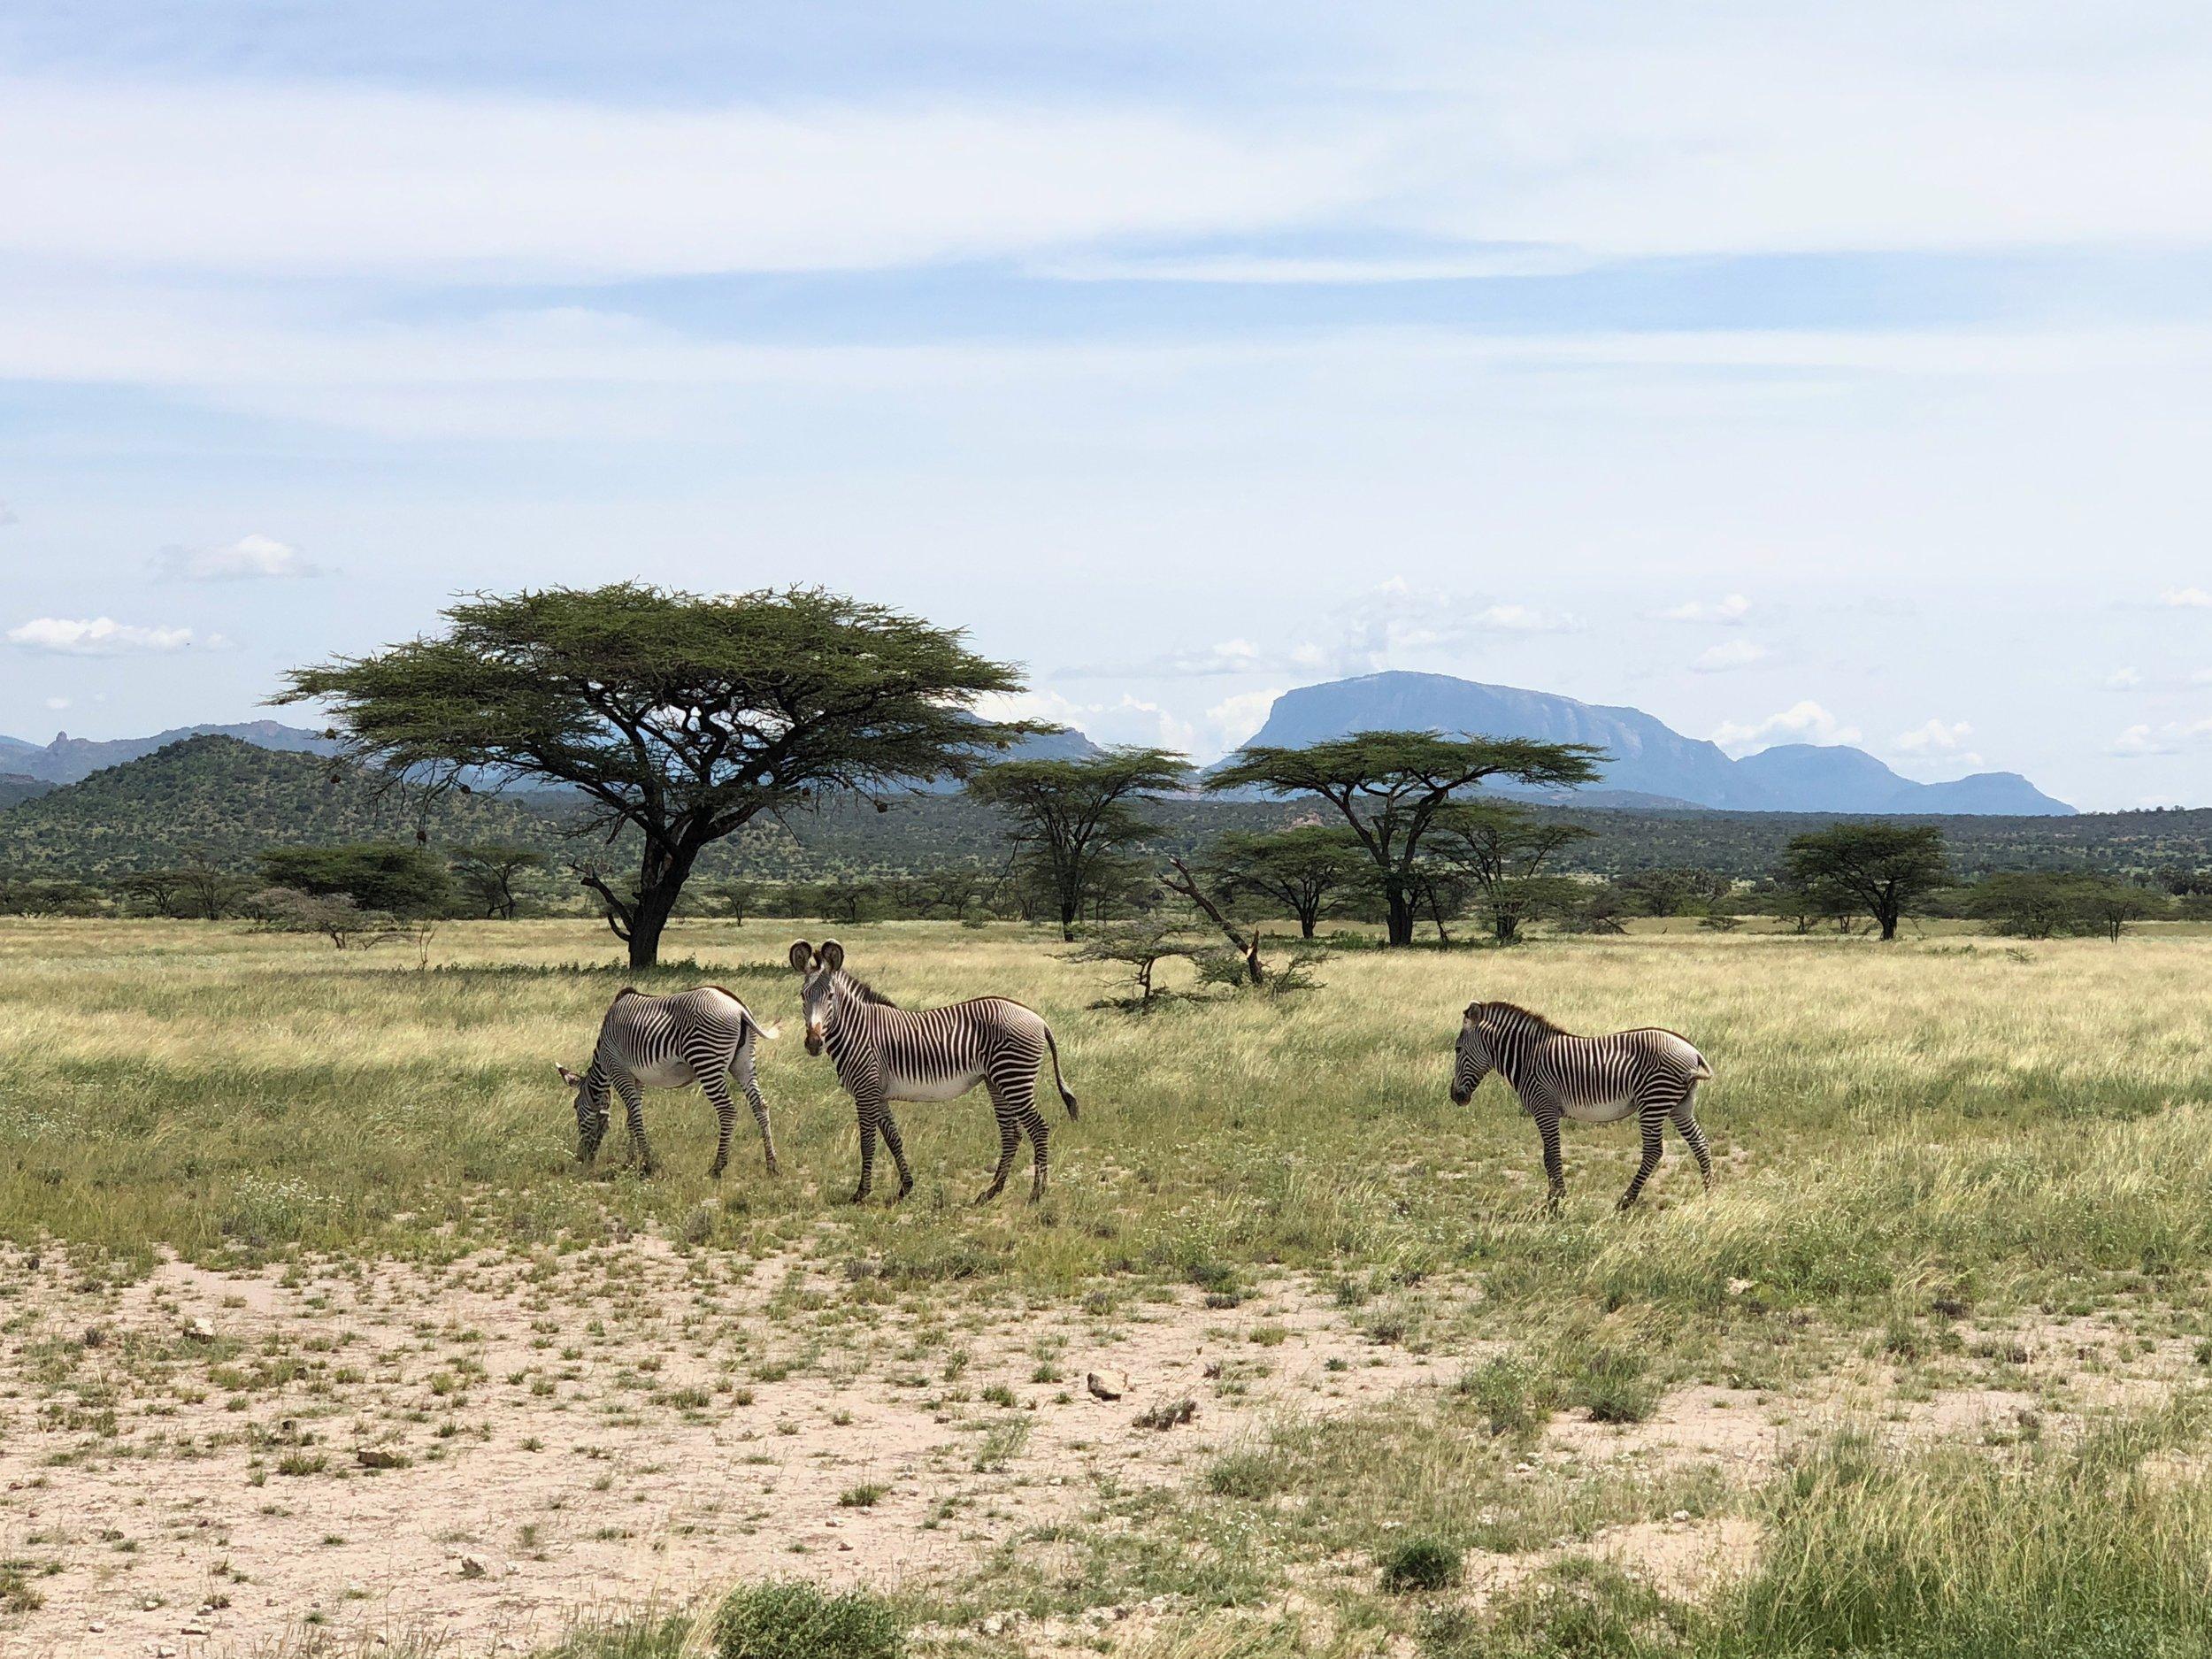 A photo by team member Linnea Engstrom on the teams impromptu safari! A highlight of the trip.